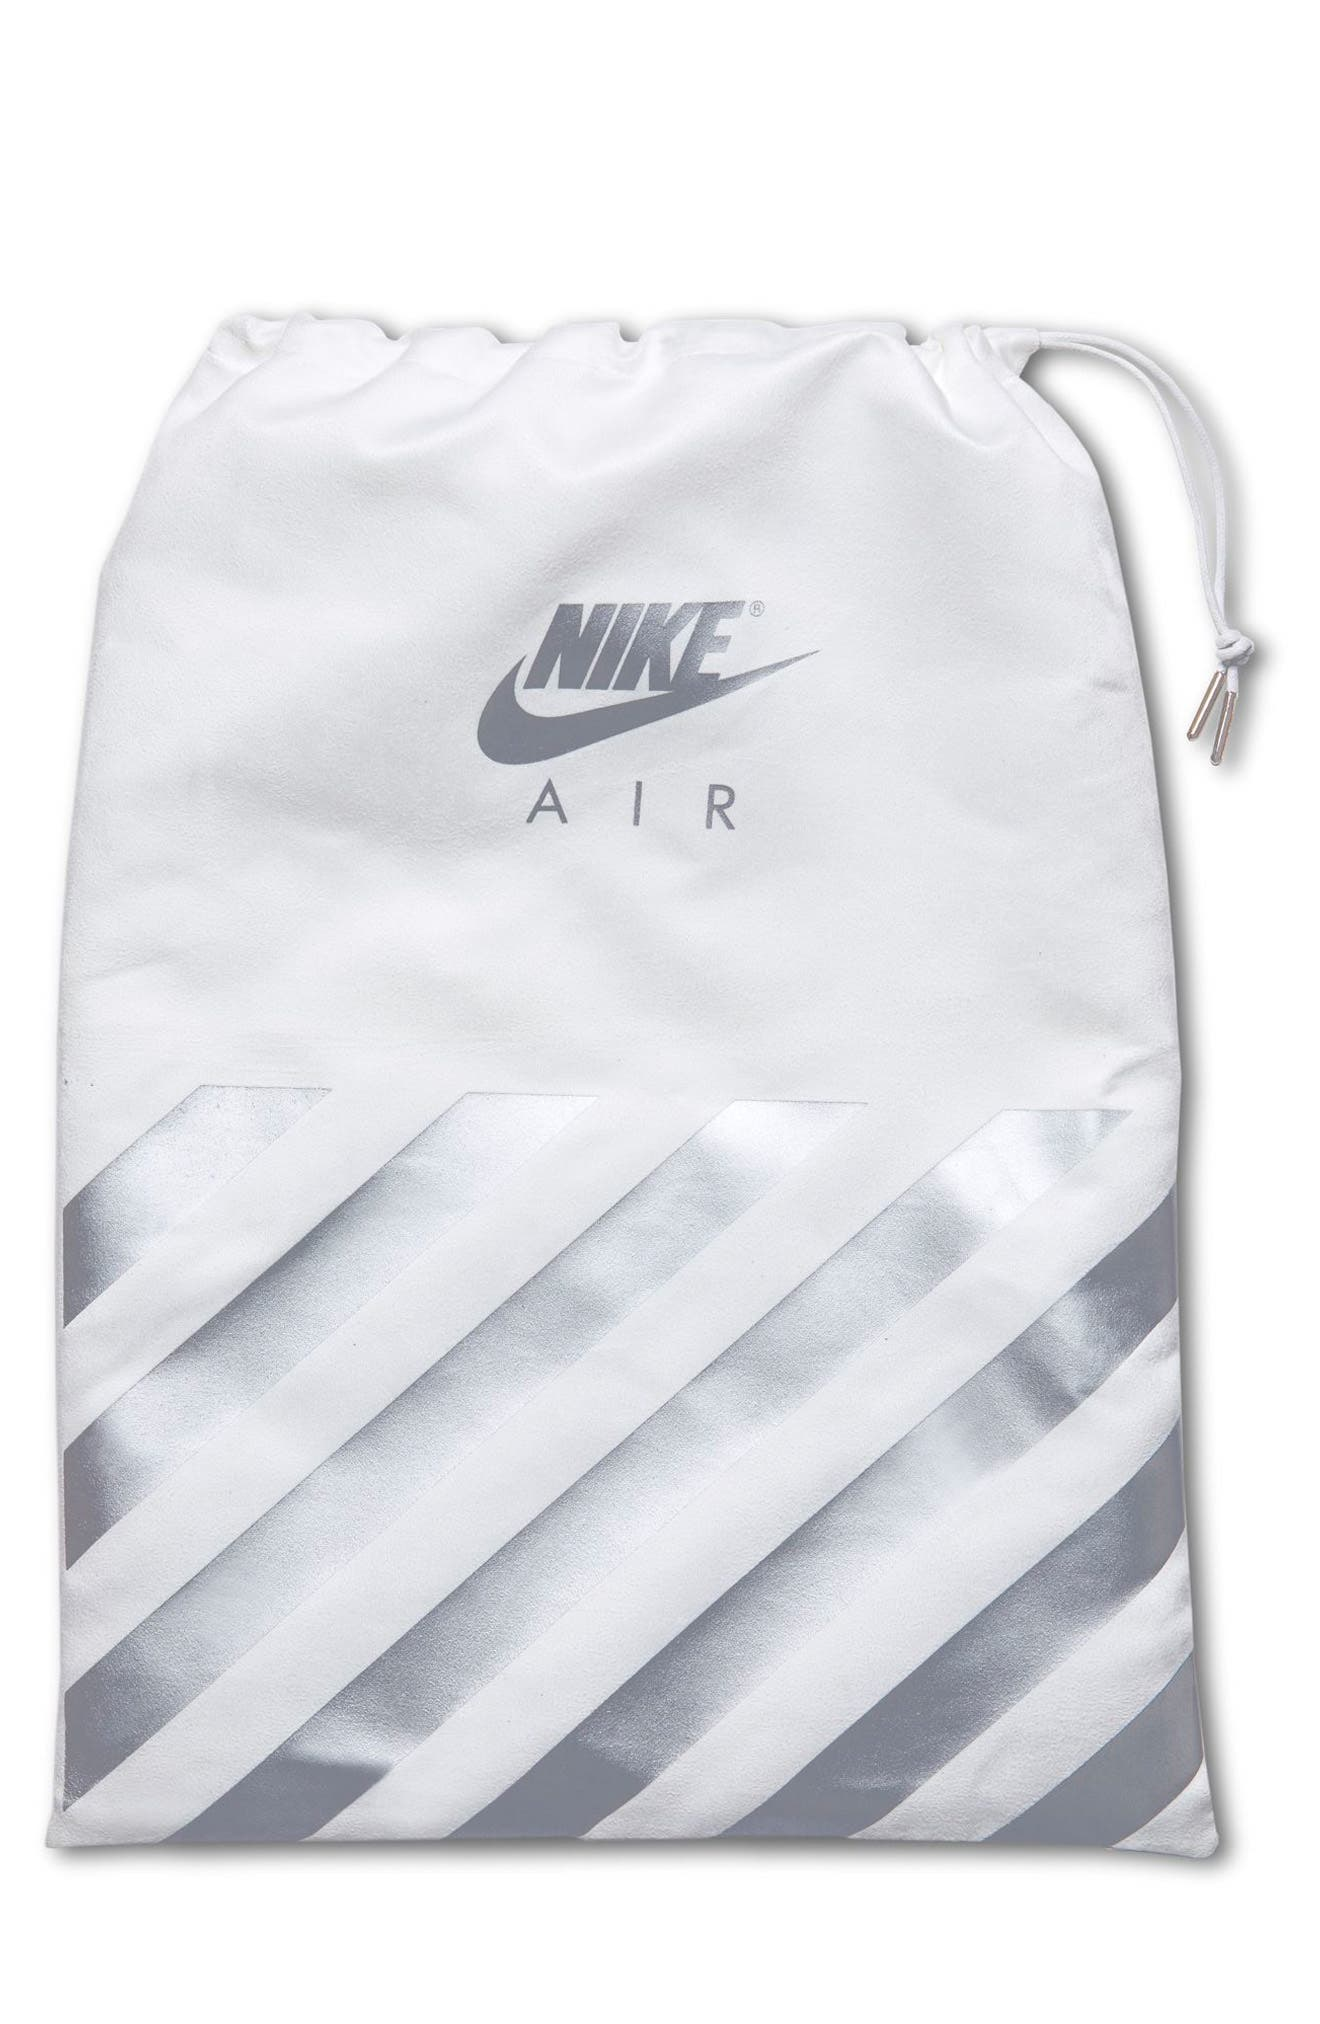 Air Max 1 Anniversary Sneaker,                             Alternate thumbnail 8, color,                             100